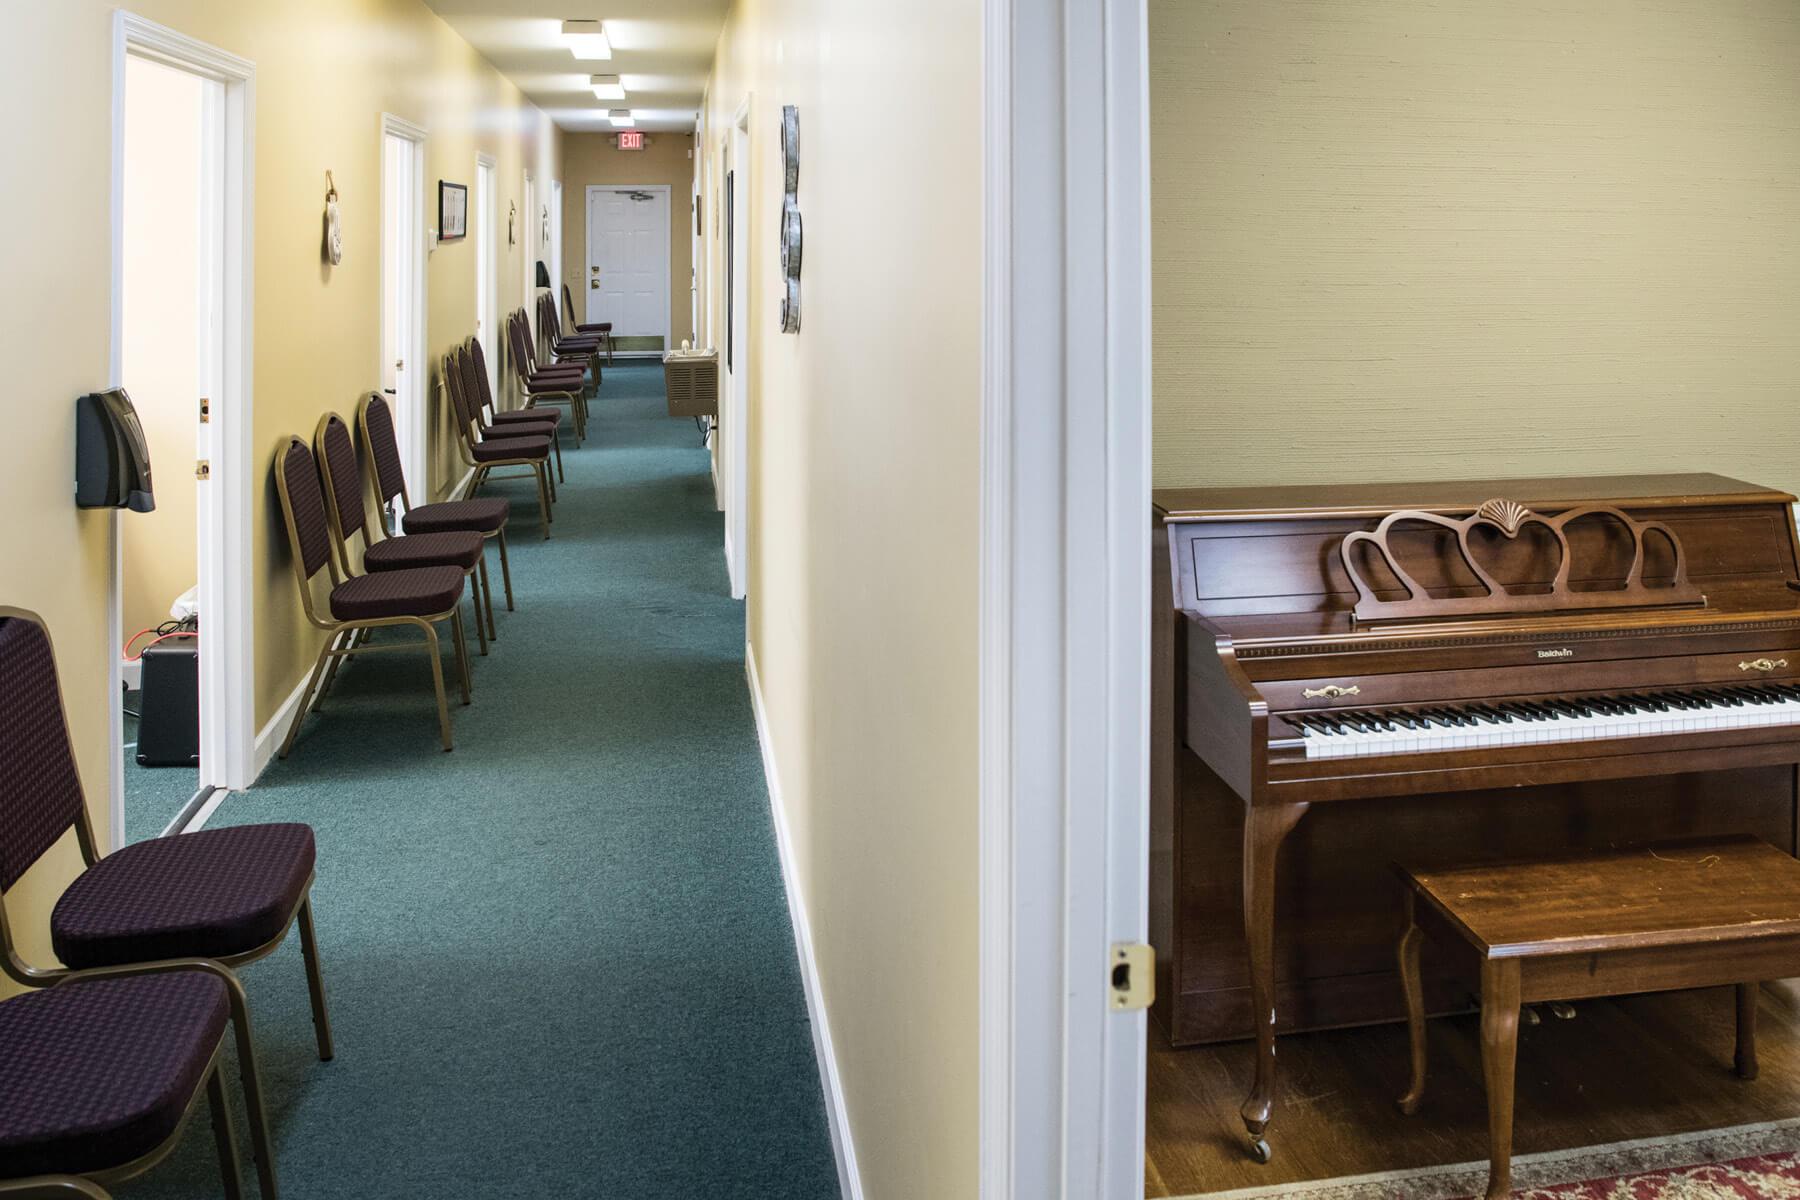 Piano and hallway at Irmo Music Academy